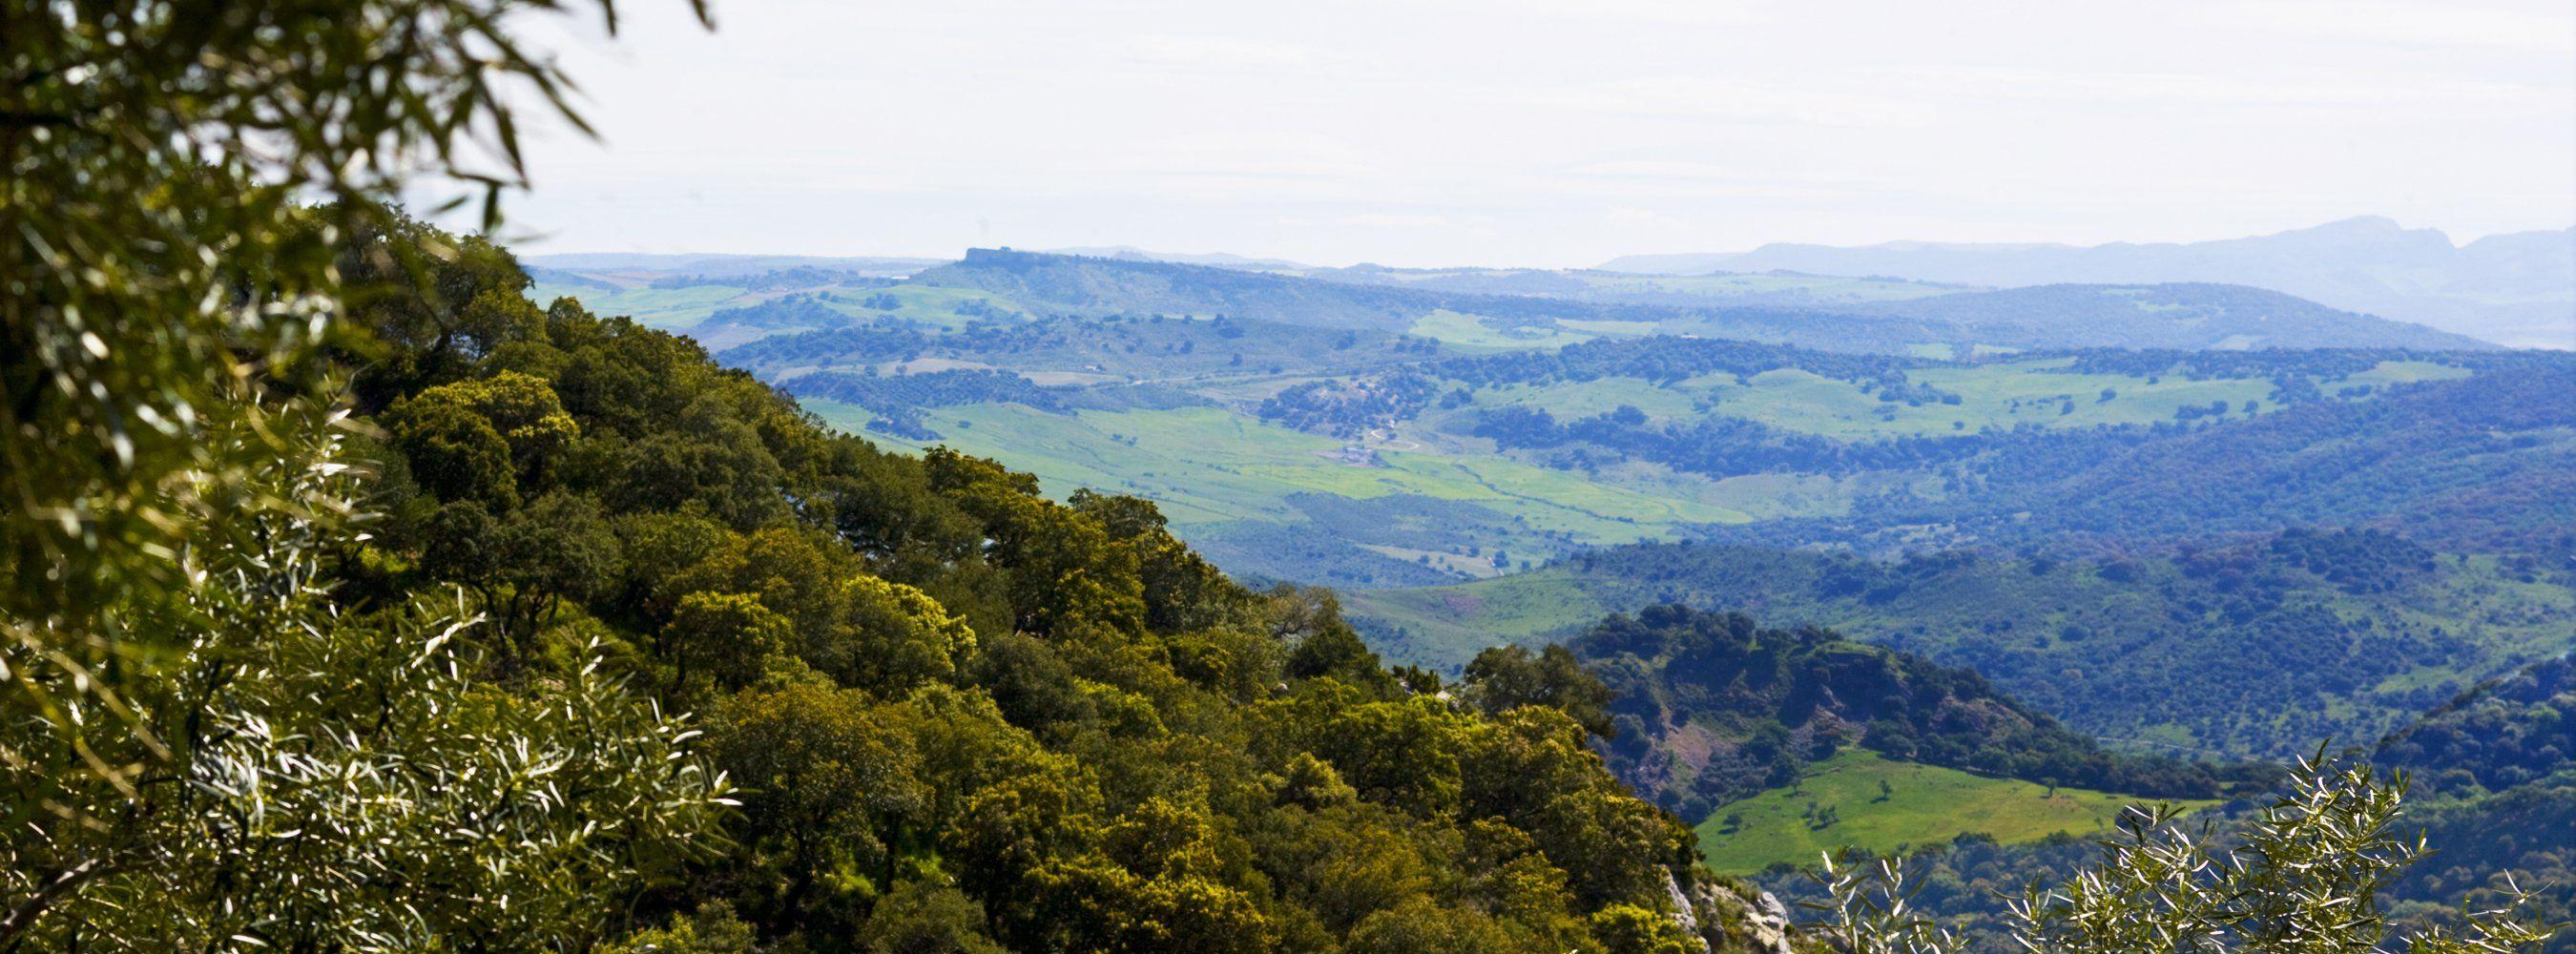 view grazalema national park